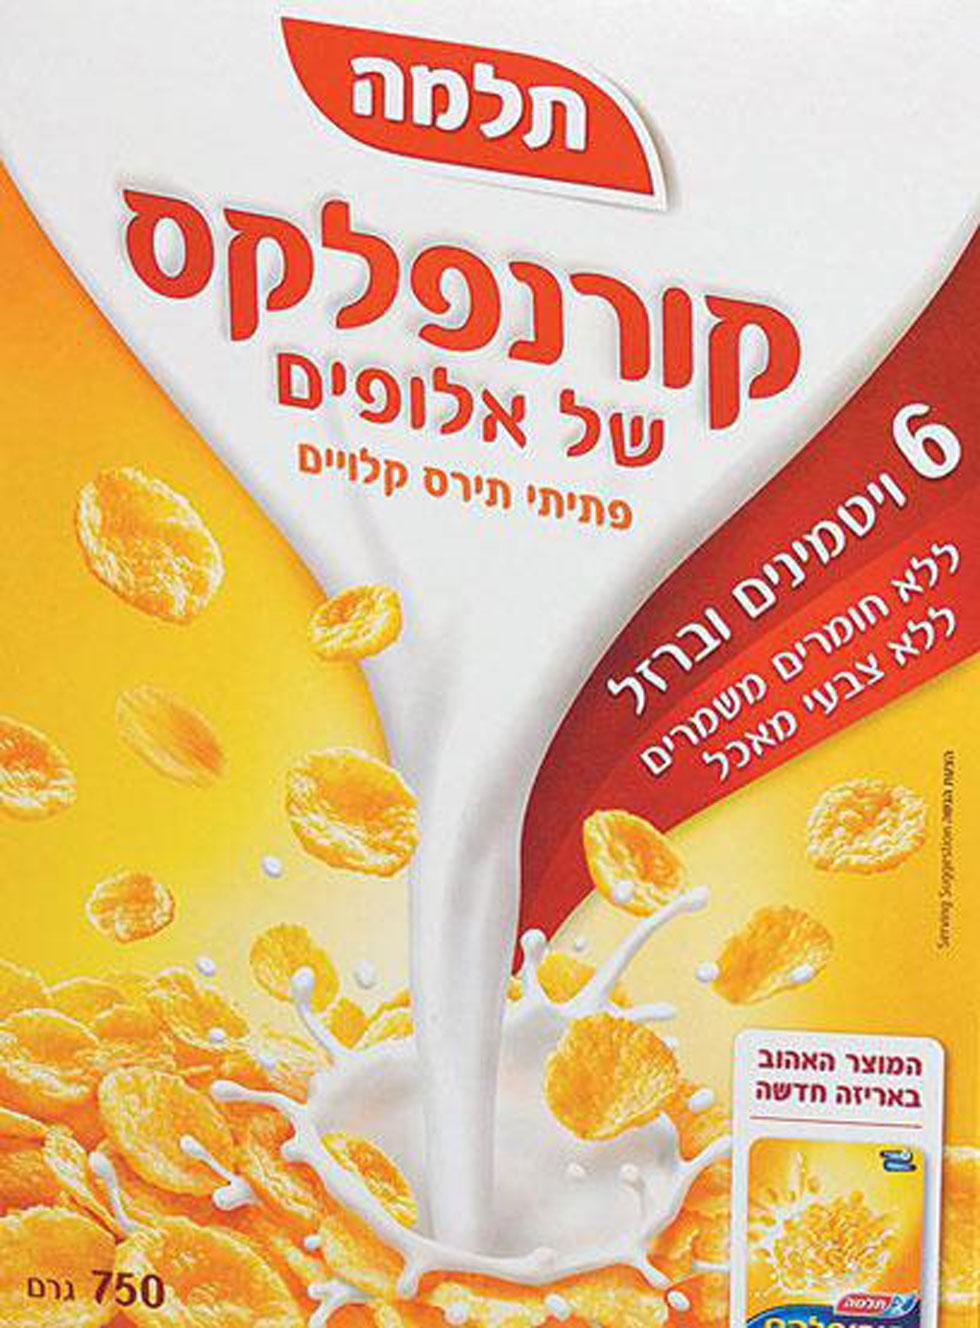 Unilever's Telma Cornflakes in Israel